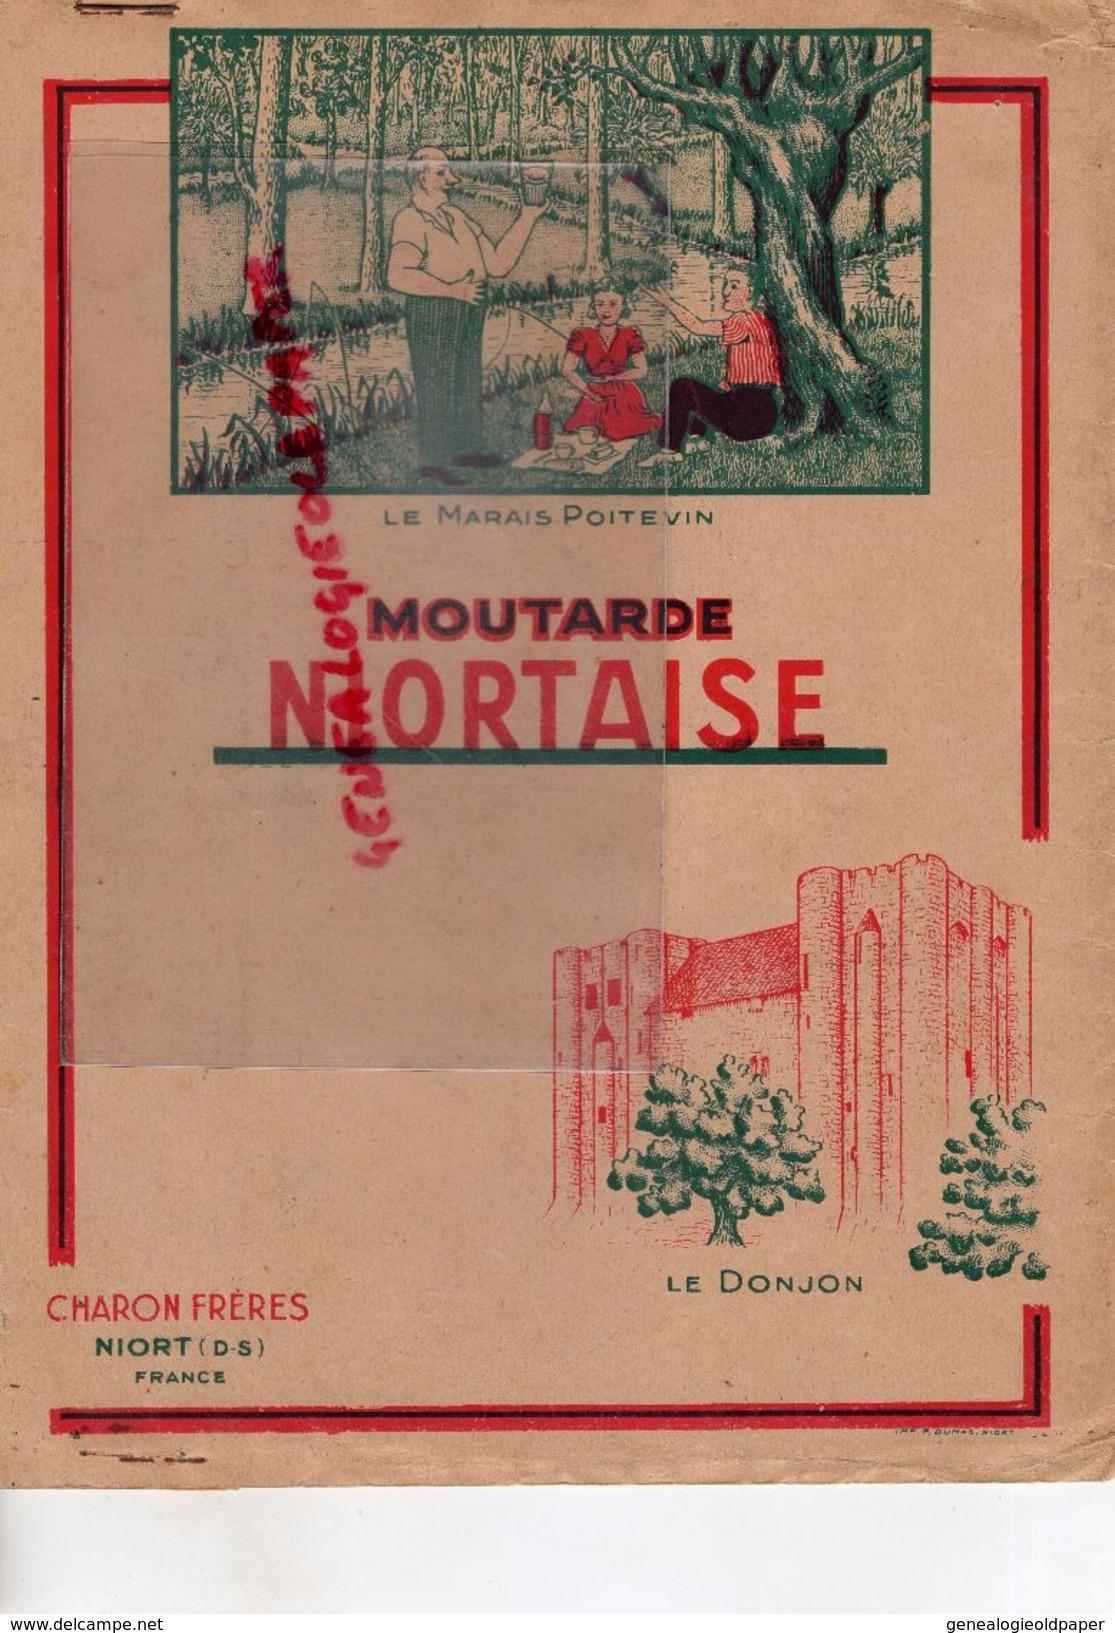 79 - NIORT - RARE PROTEGE CAHIER CHARON FRERES- MOUTARDE NIORTAISE- JEAN MICHEL PIERRE 1952-1953-MARAIS POITEVIN-DONJON - Book Covers